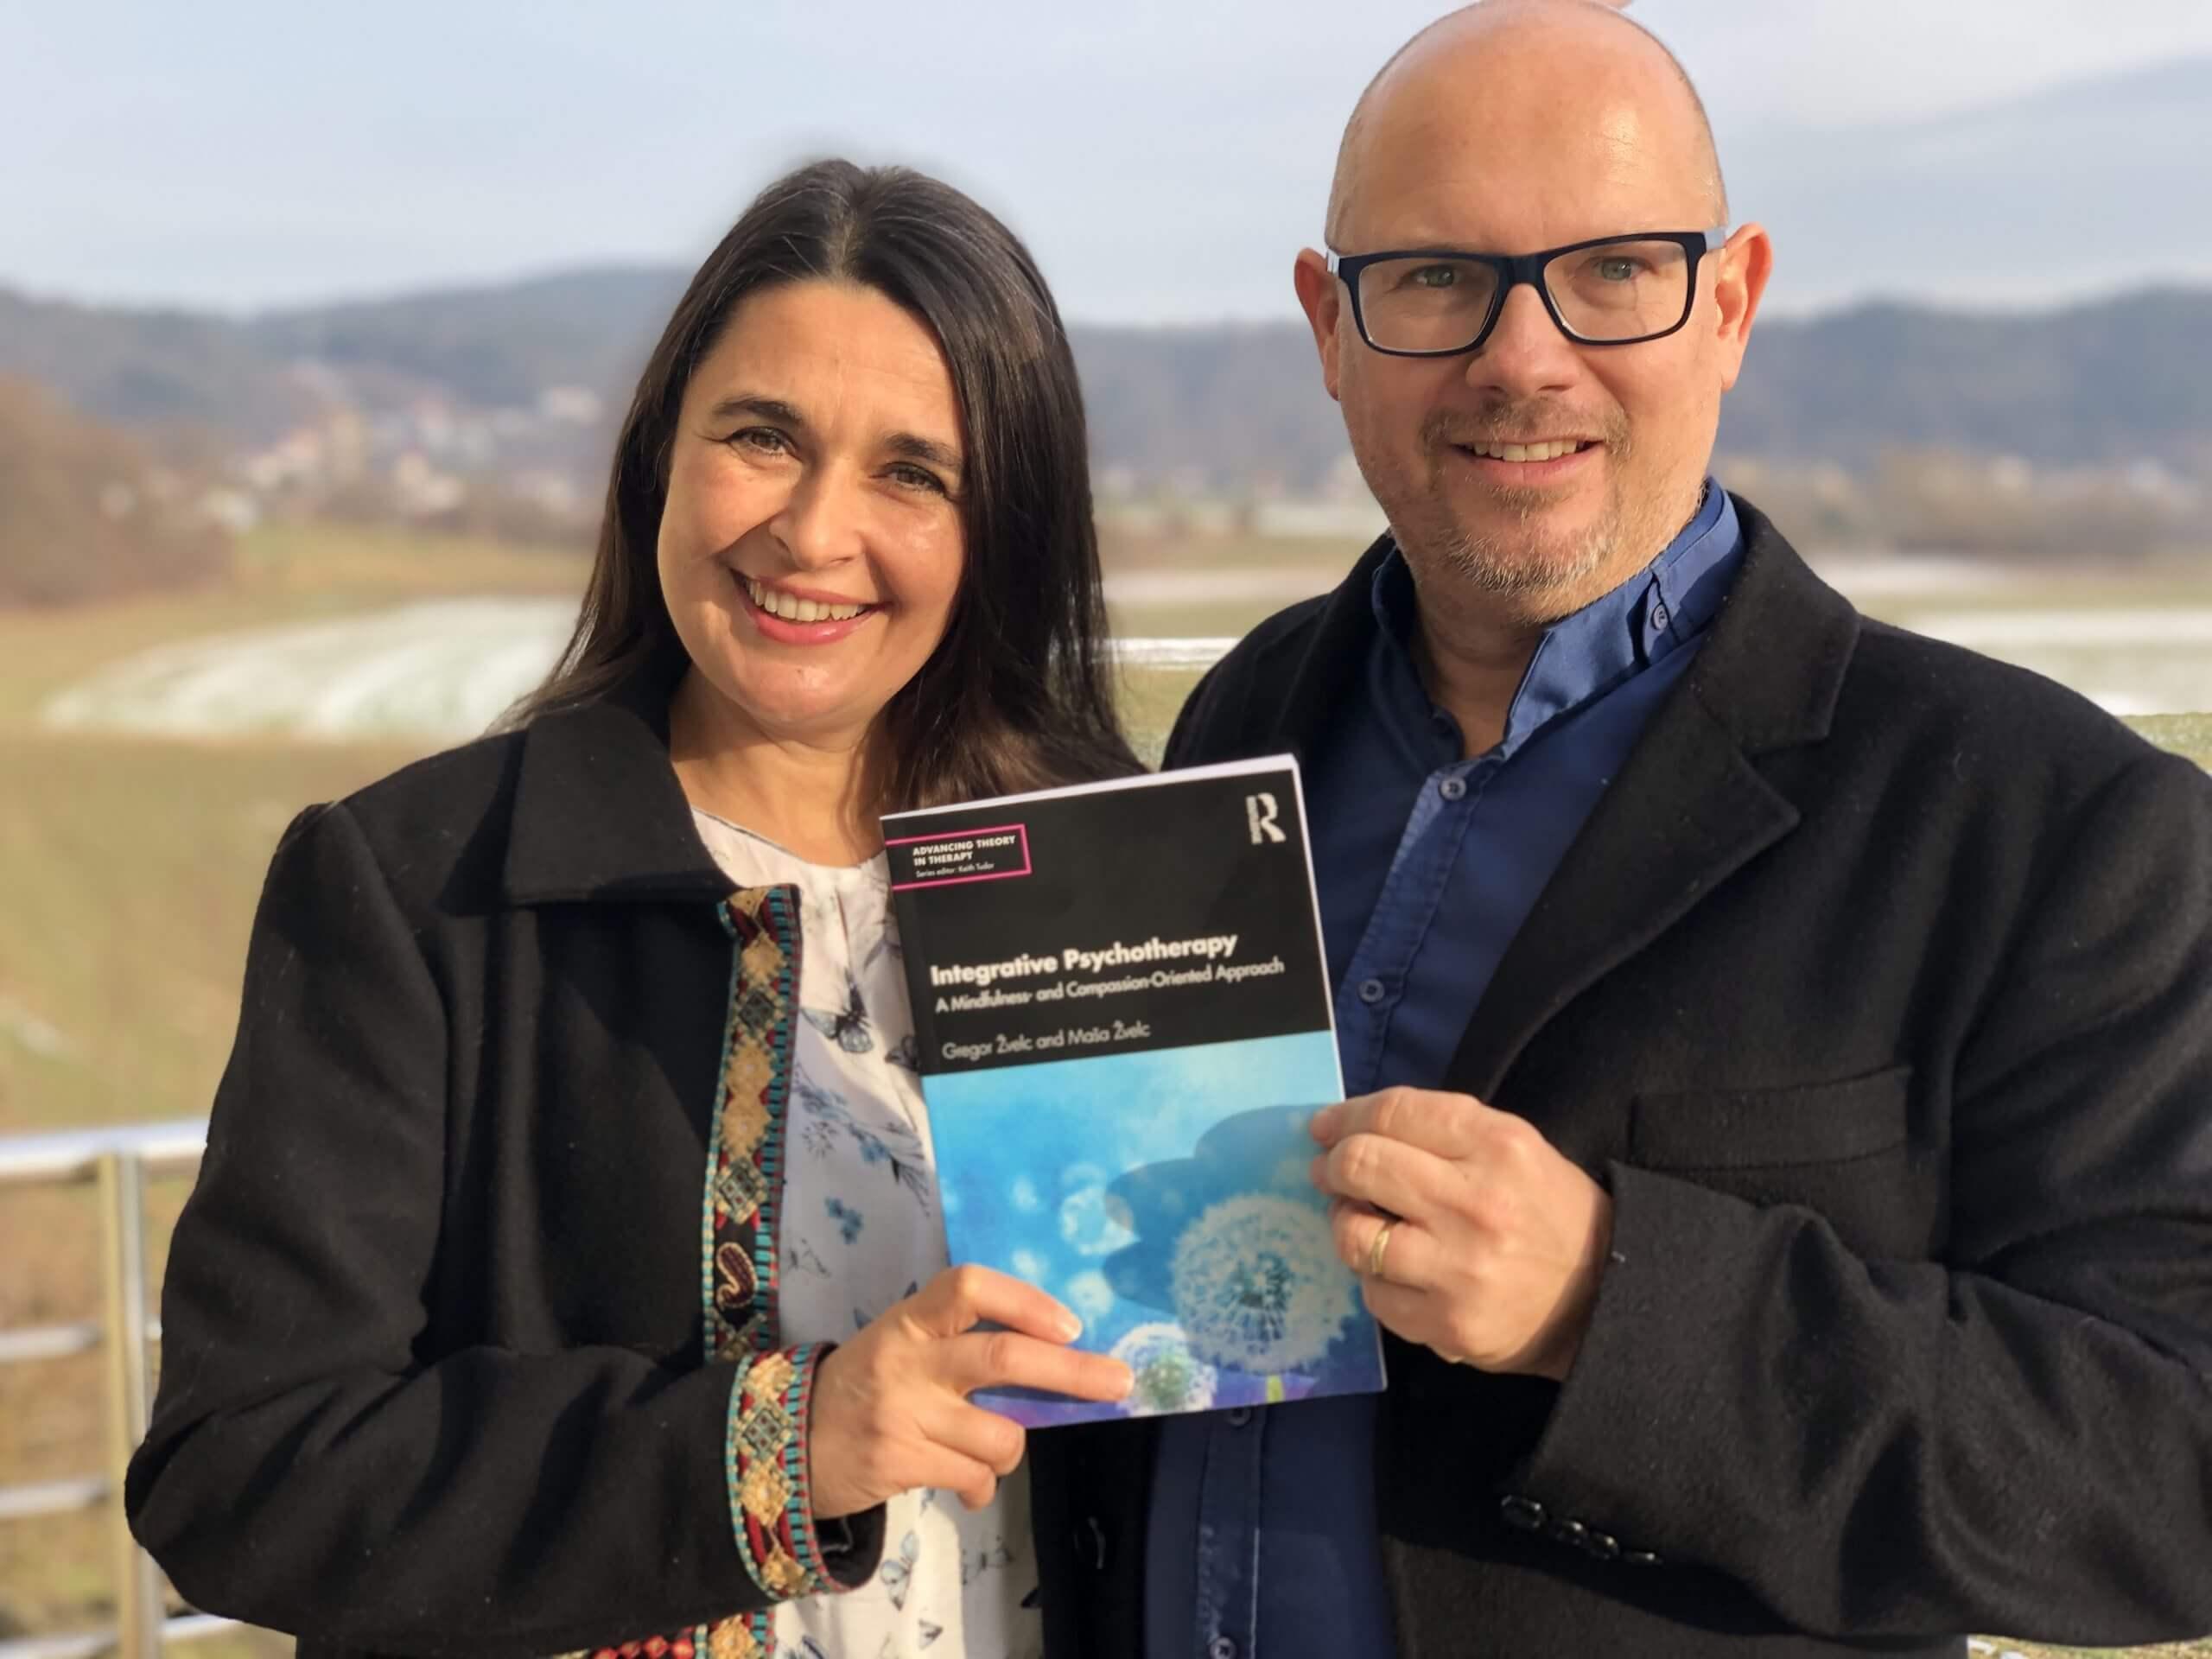 Knjiga Integrative Psychotherapy